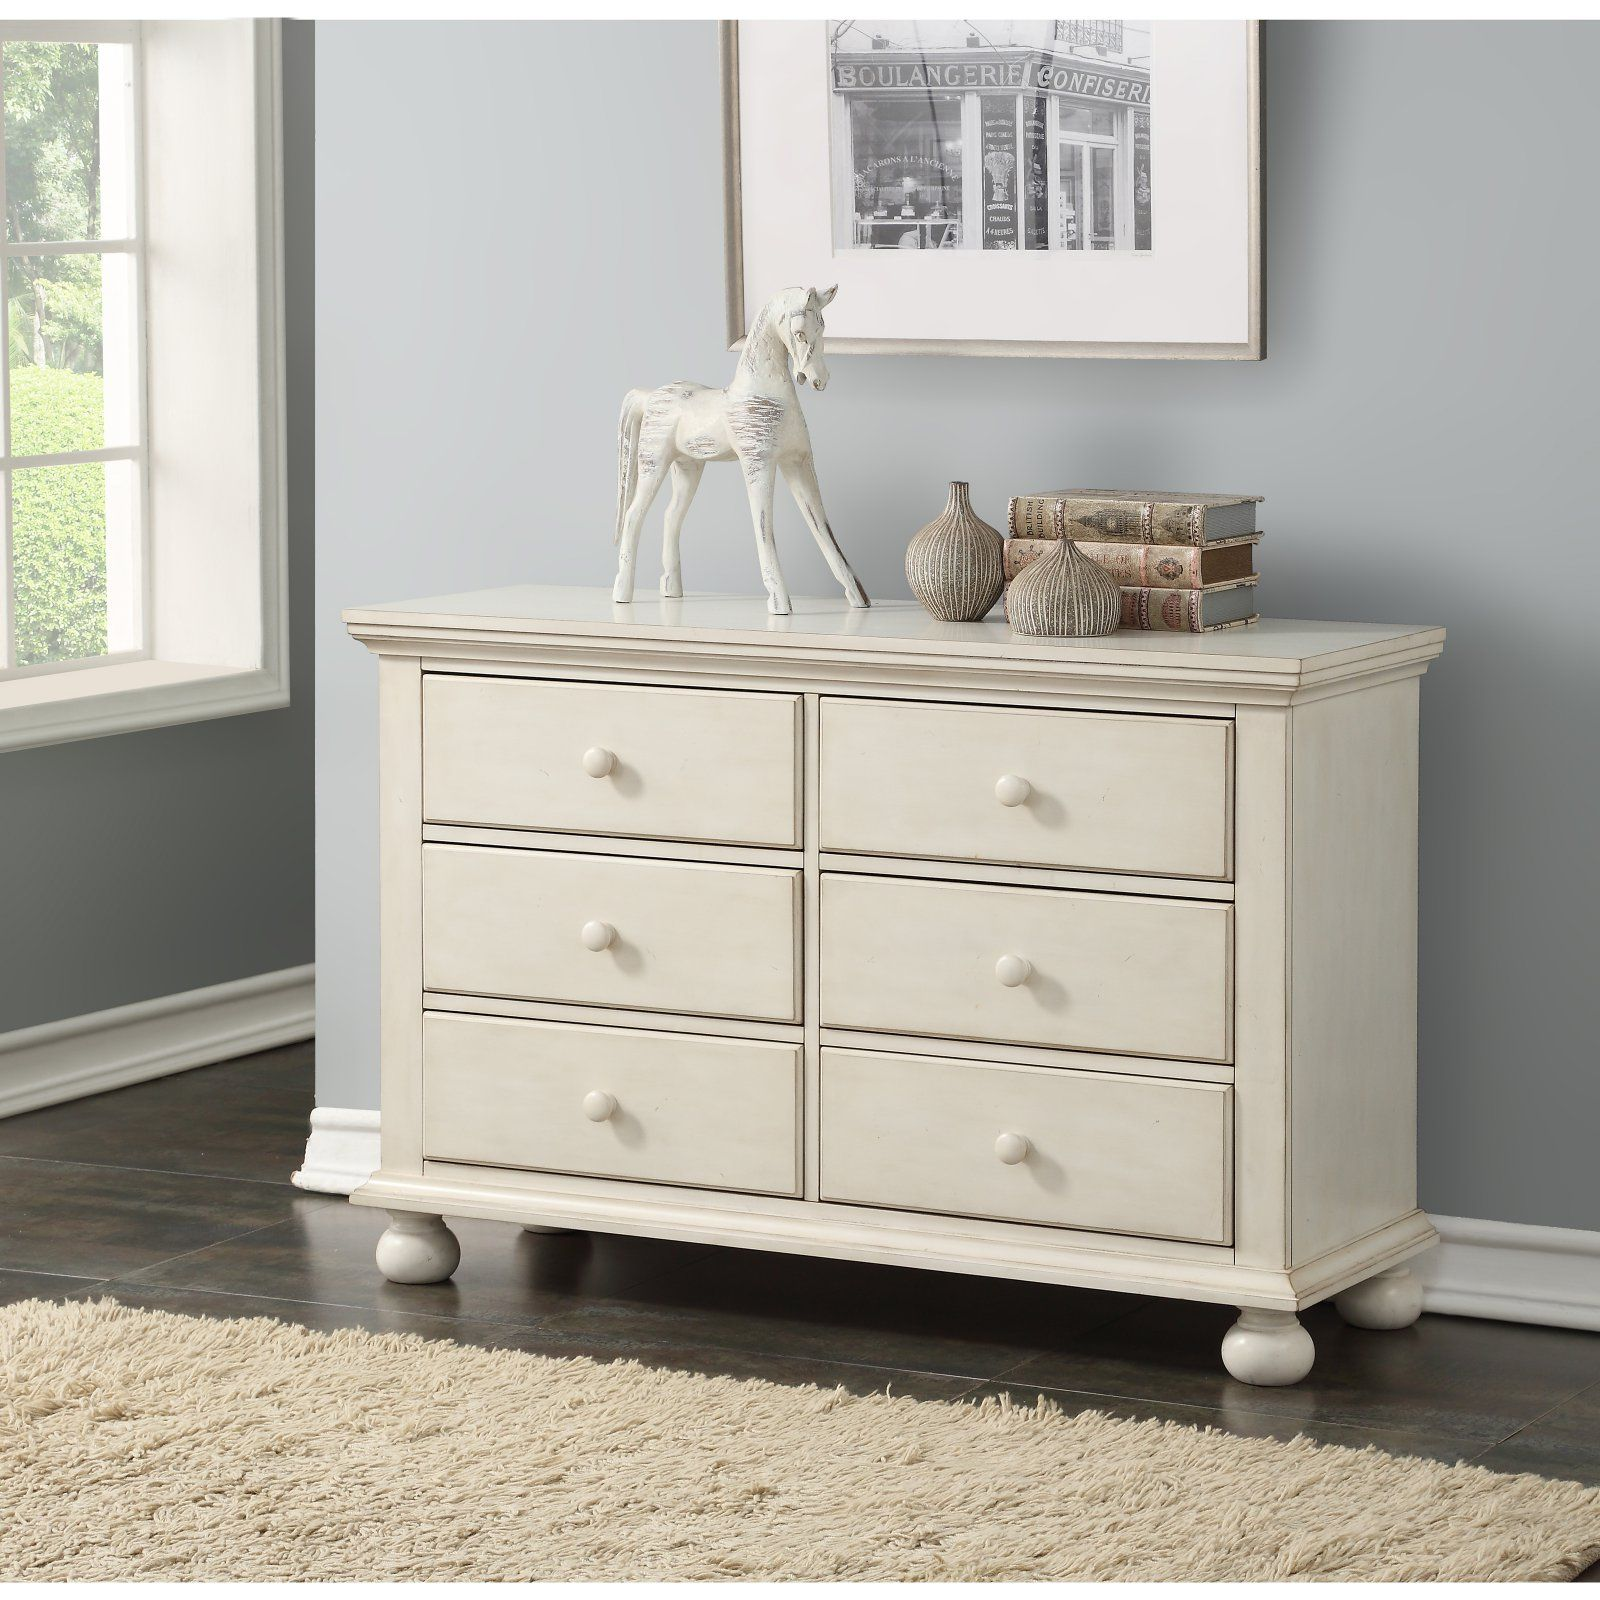 Comfort Pointe Alida 6 Drawer Dresser White 6 Drawer Dresser 6 Drawer Dresser Furniture [ 1600 x 1600 Pixel ]